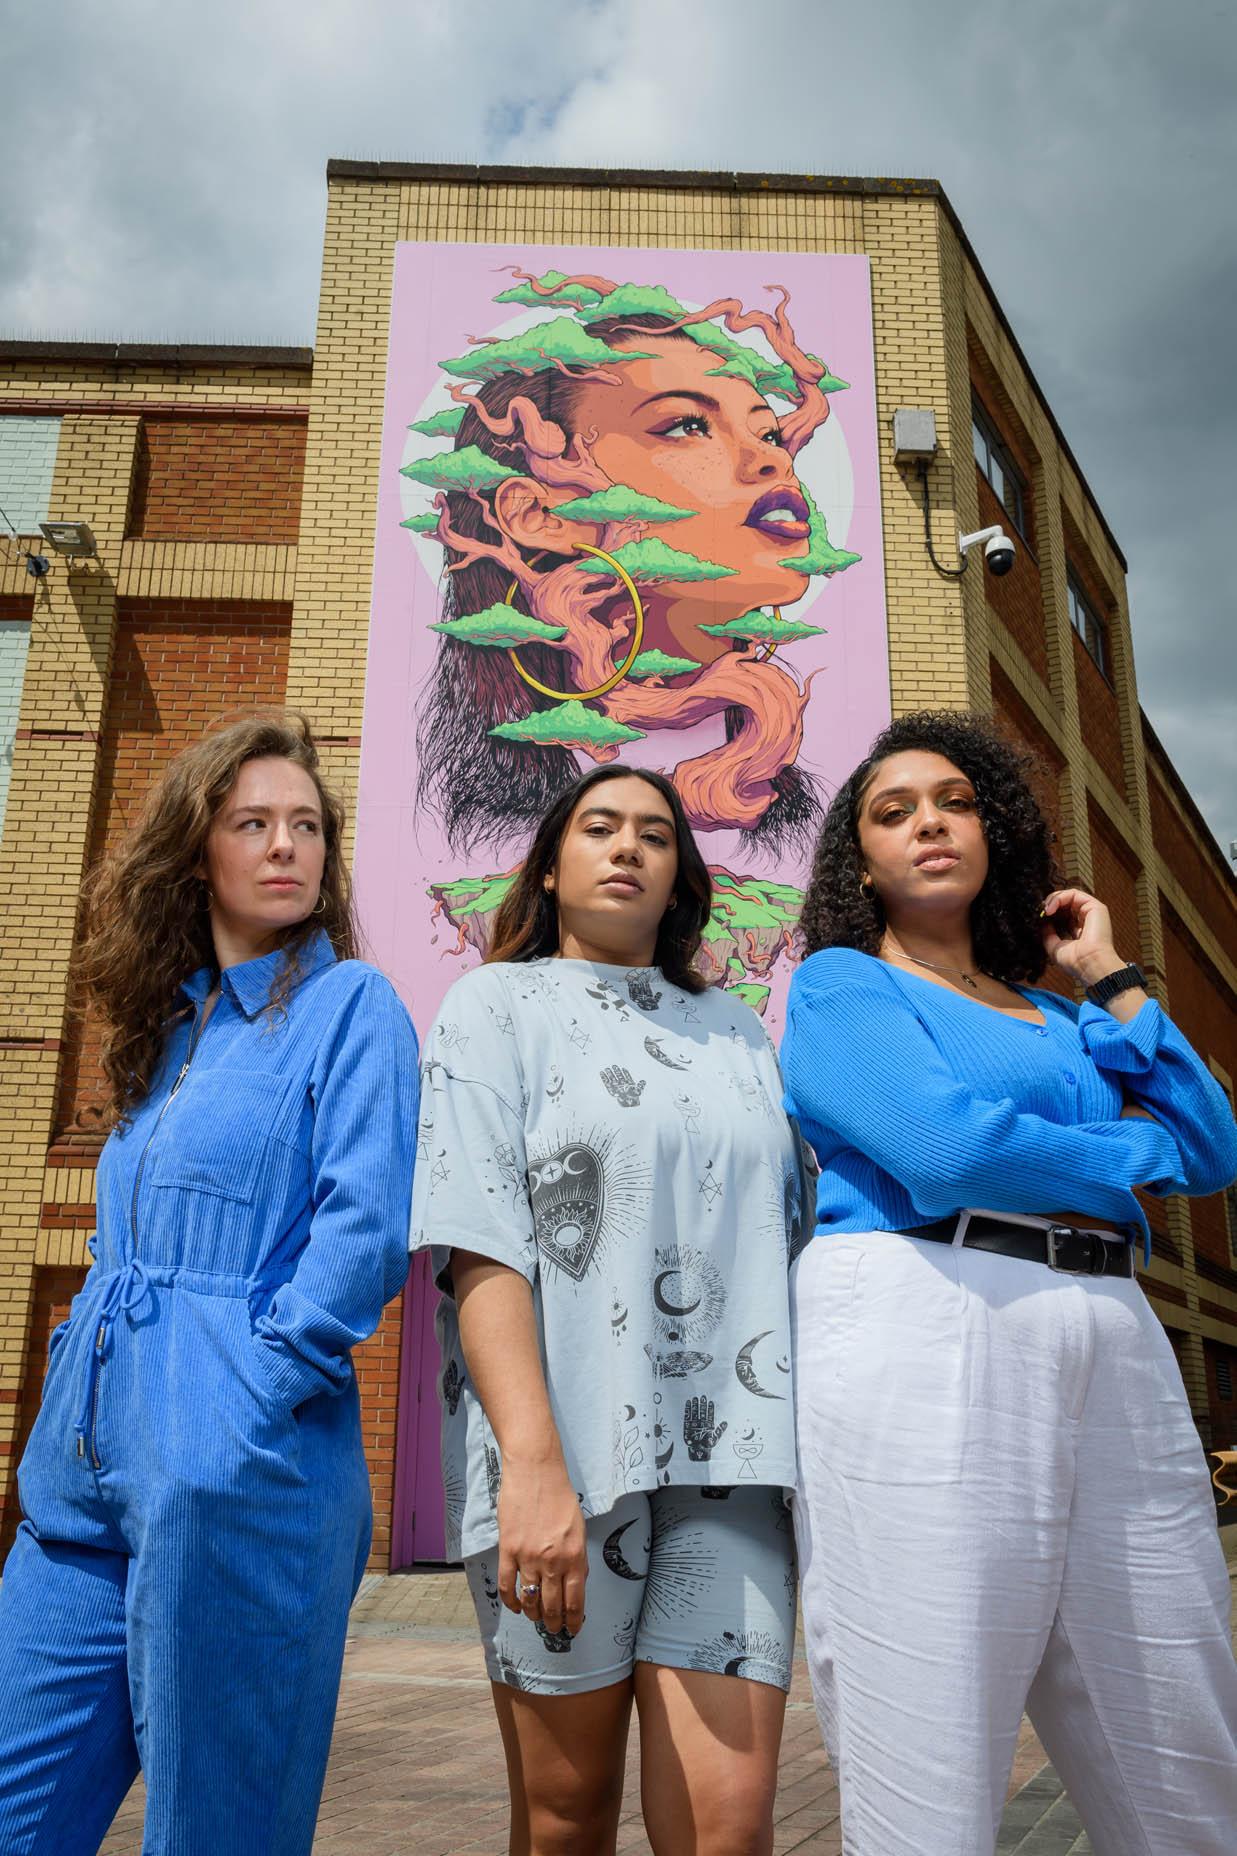 (L-R) Frankie Meredith, Balisha Karra and Yasmin Dawes